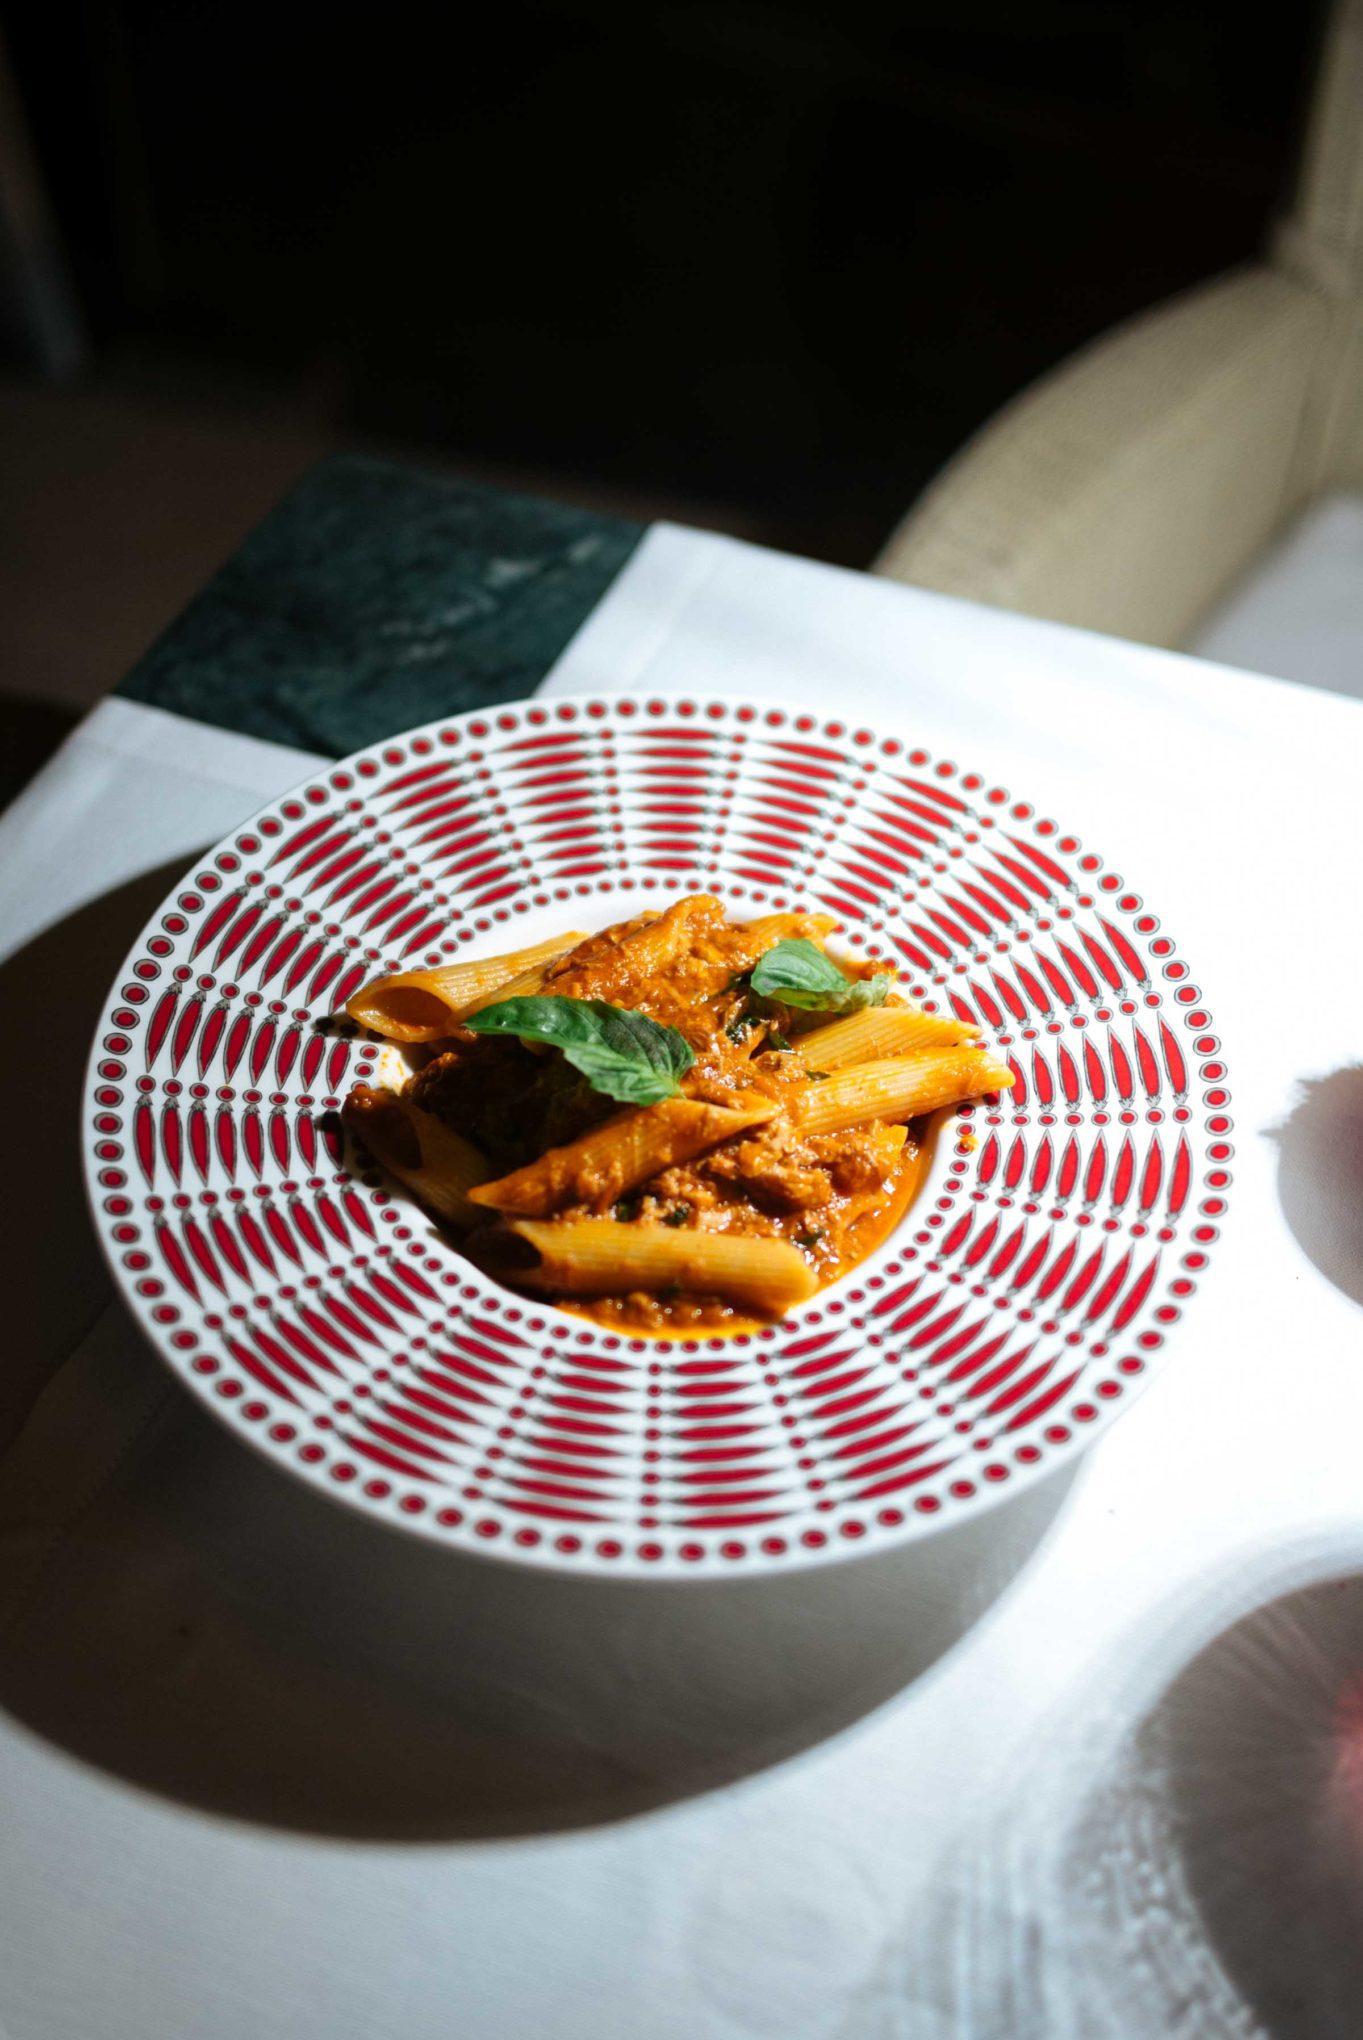 The Mezzatorre Hotel in Ischia's La Torre restaurant serving traditional Neapolitan ragu pasta. Ischia, Italy - Photo by The Taste SF, Sarah Stanfield